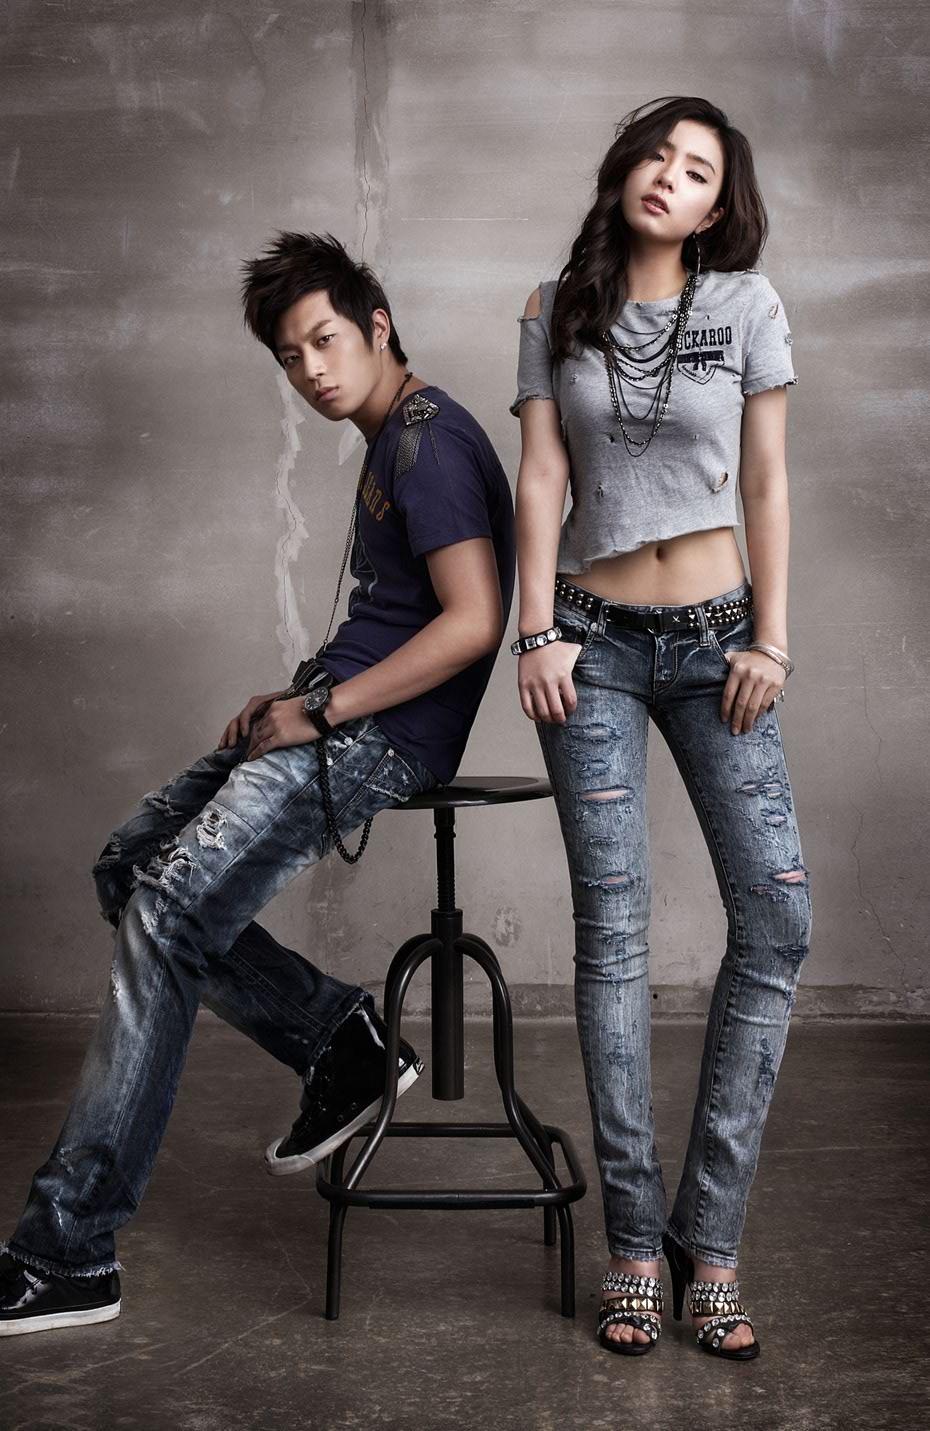 BEAST'S Doojoon and SHIN SE KYUNG for Buckaroo Jeans Spring/Summer ...